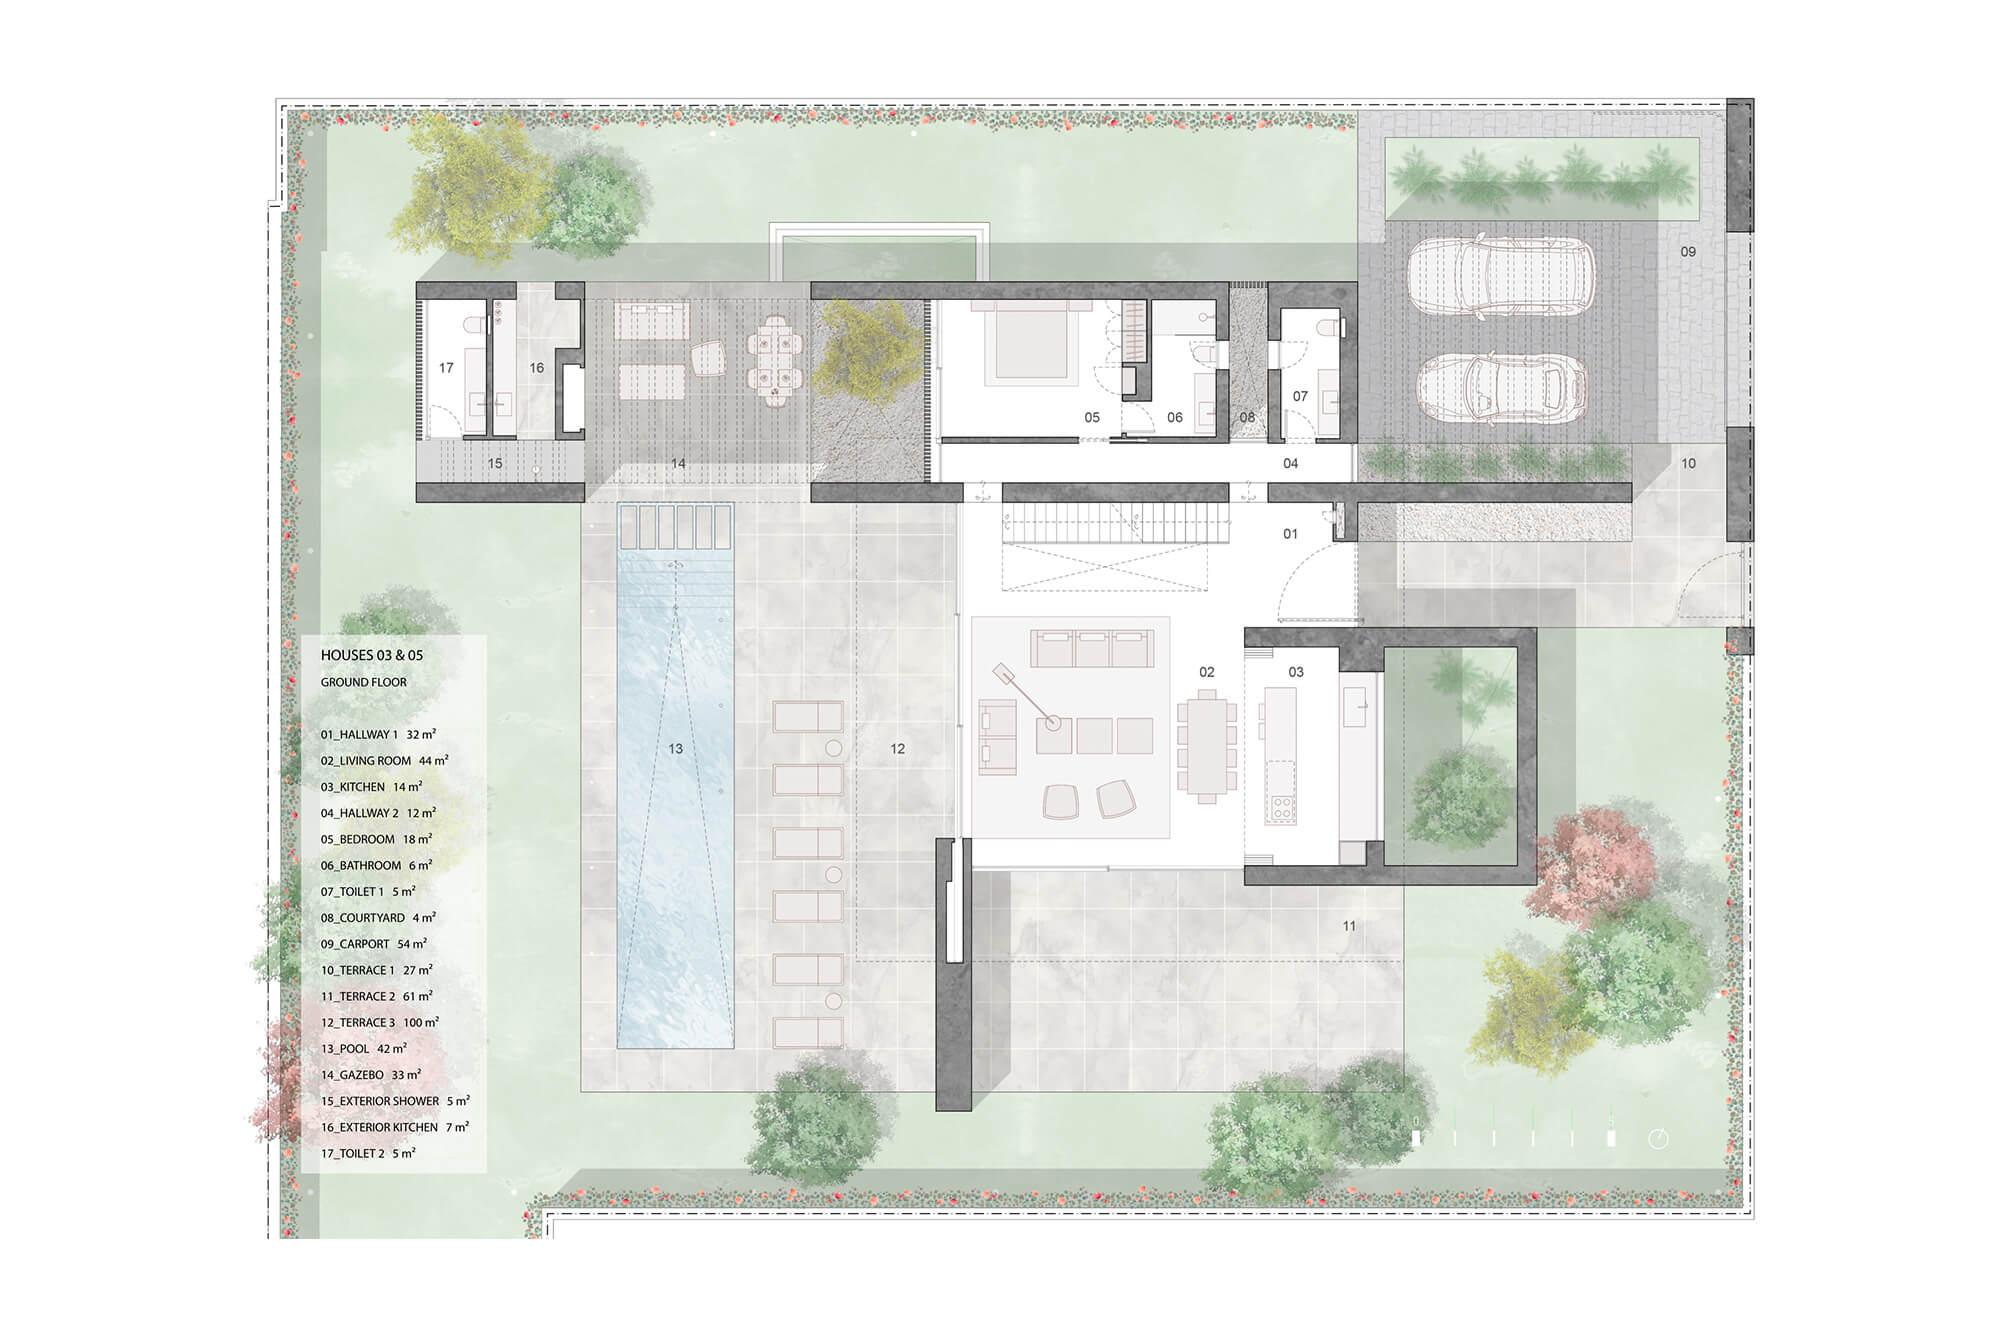 cortijo blanco beach villa vamoz te koop marbella costa del sol spanje nieuwbouw grondplan 3 gelijkvloers